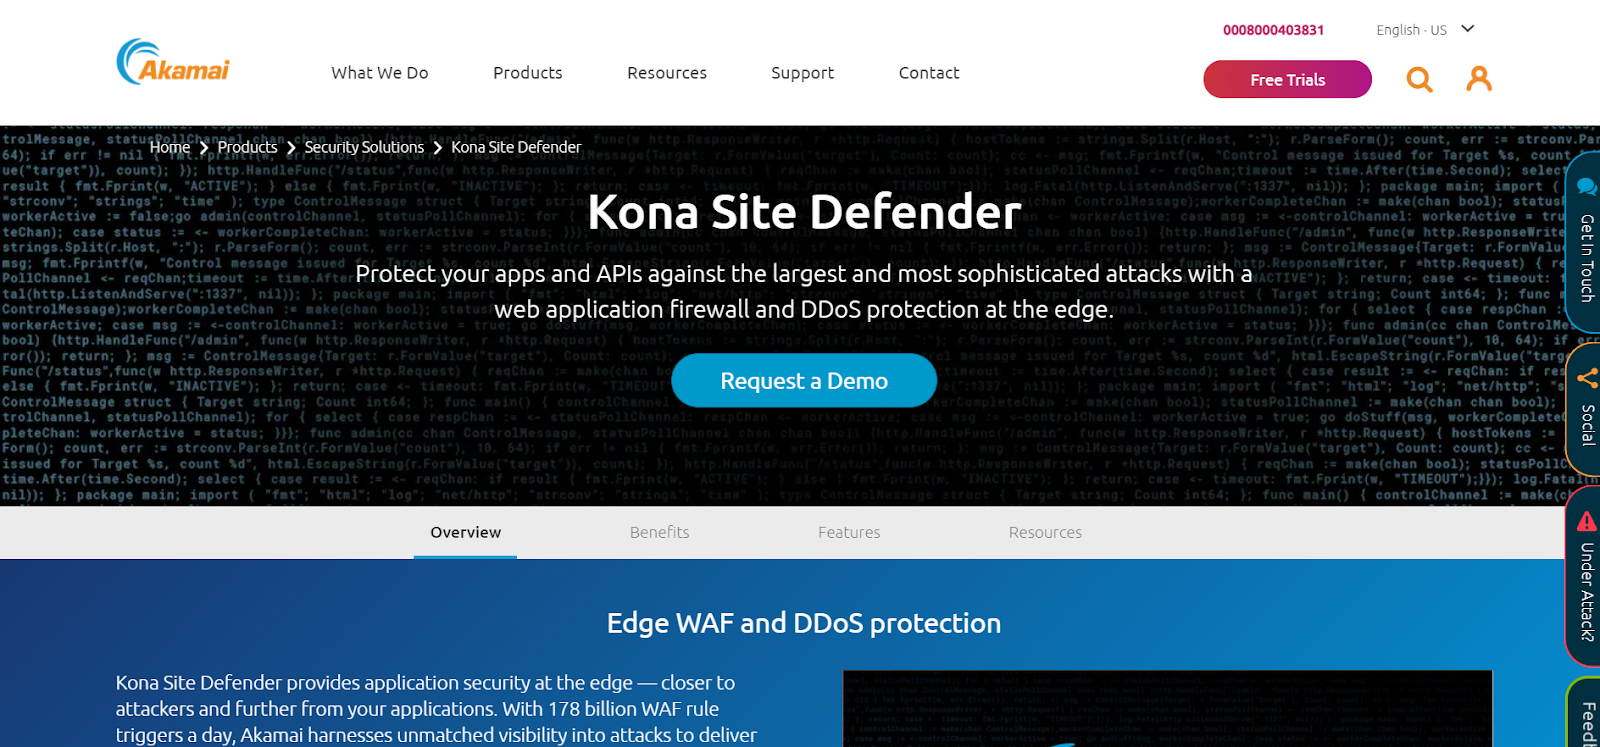 Akamai Kona Site Defender is a Web Application Firewall Application